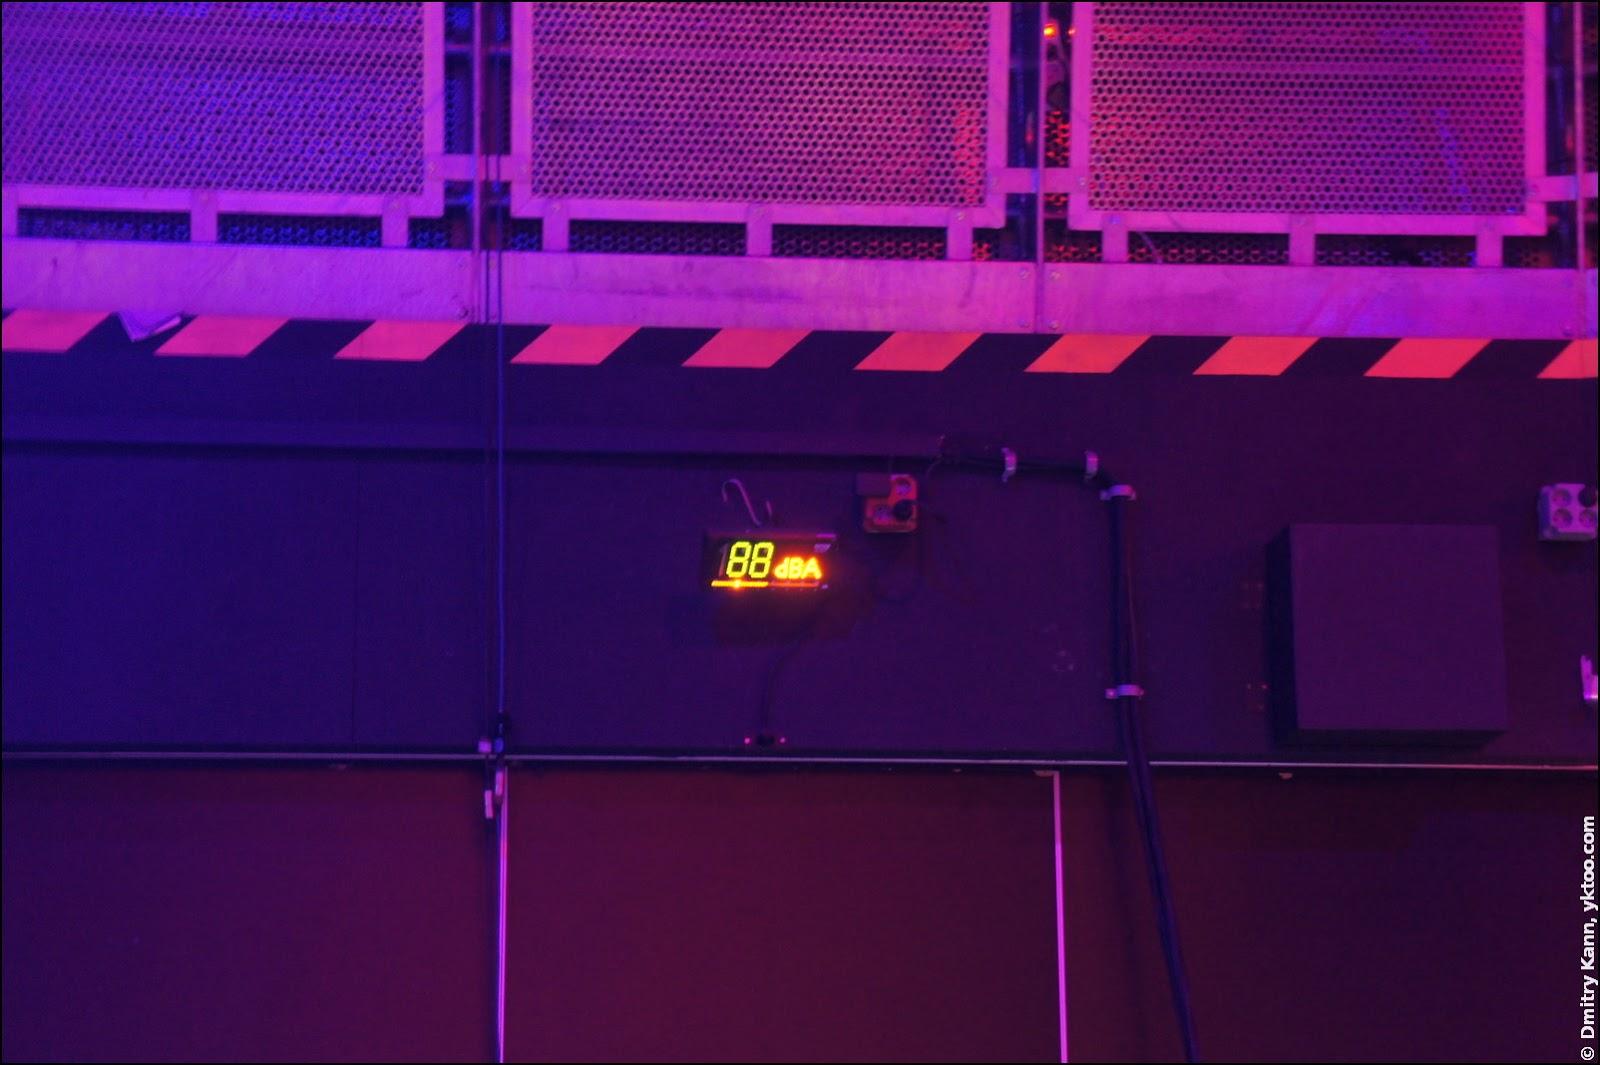 Sound level meter: 88 dBA.